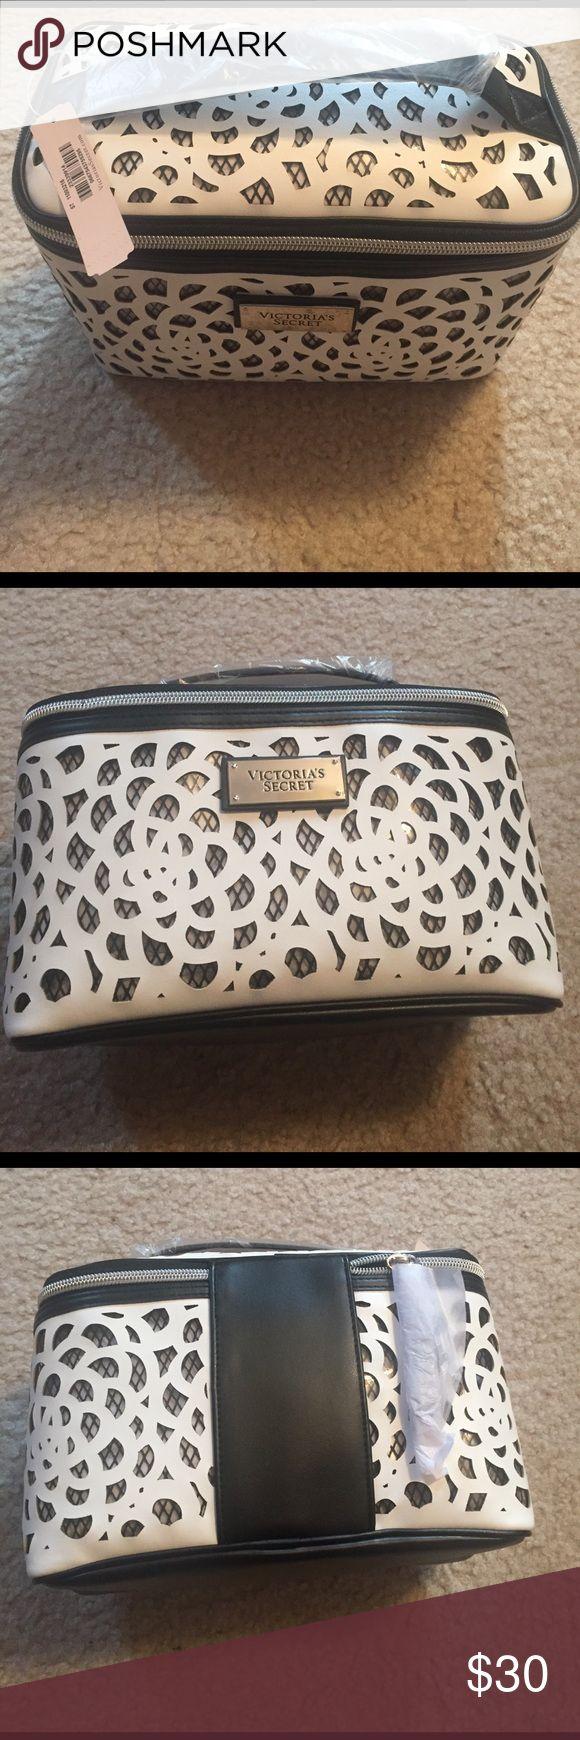 NWT Victoria's Sectret makeup bag Medium size, no trades please! Victoria's Secret Makeup